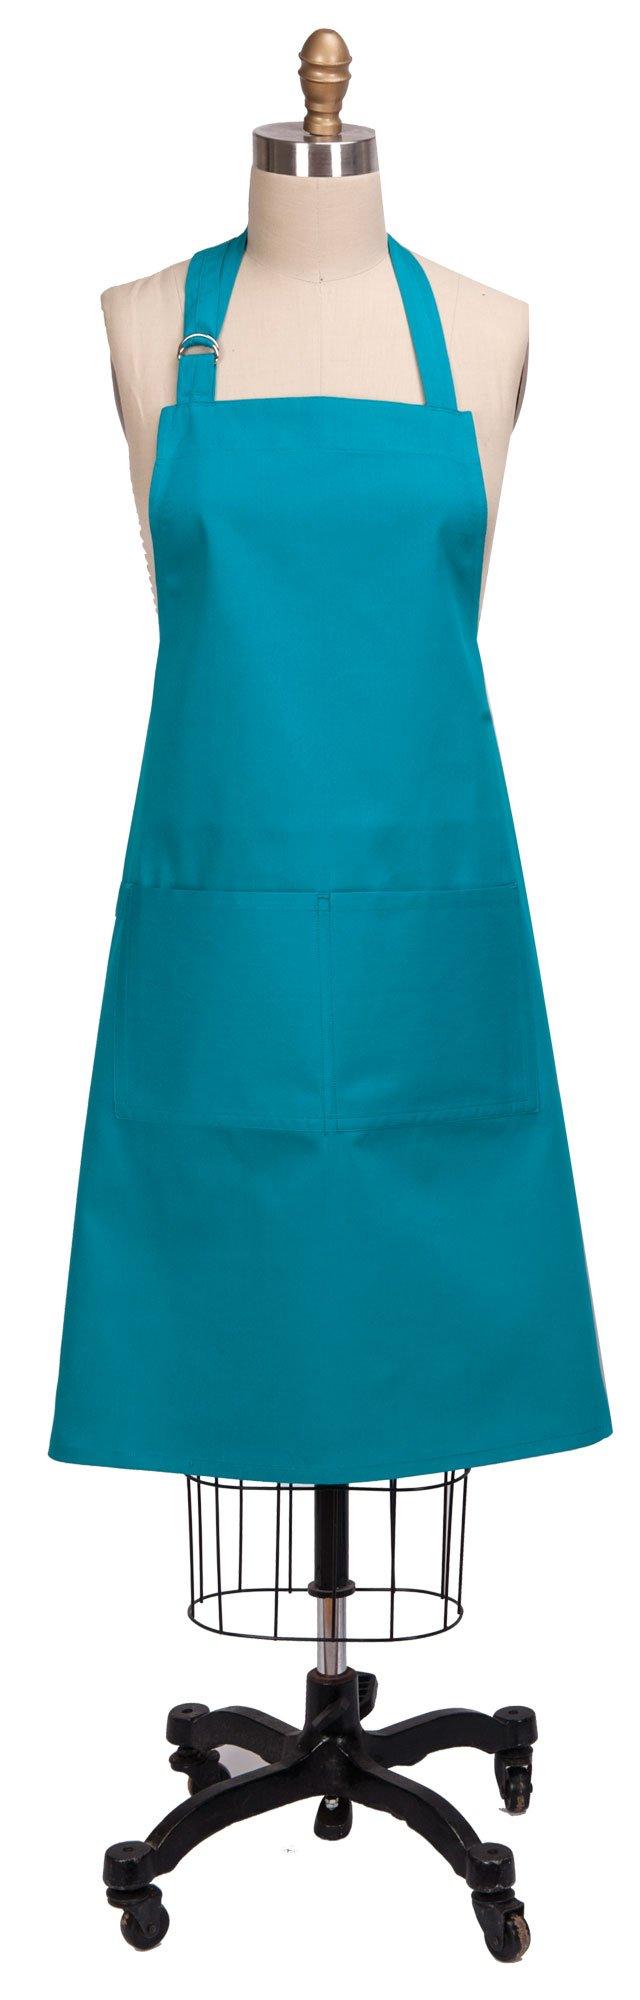 Kay Dee Designs R9261 Everyday Basics Chef Apron, Enamel by Kay Dee